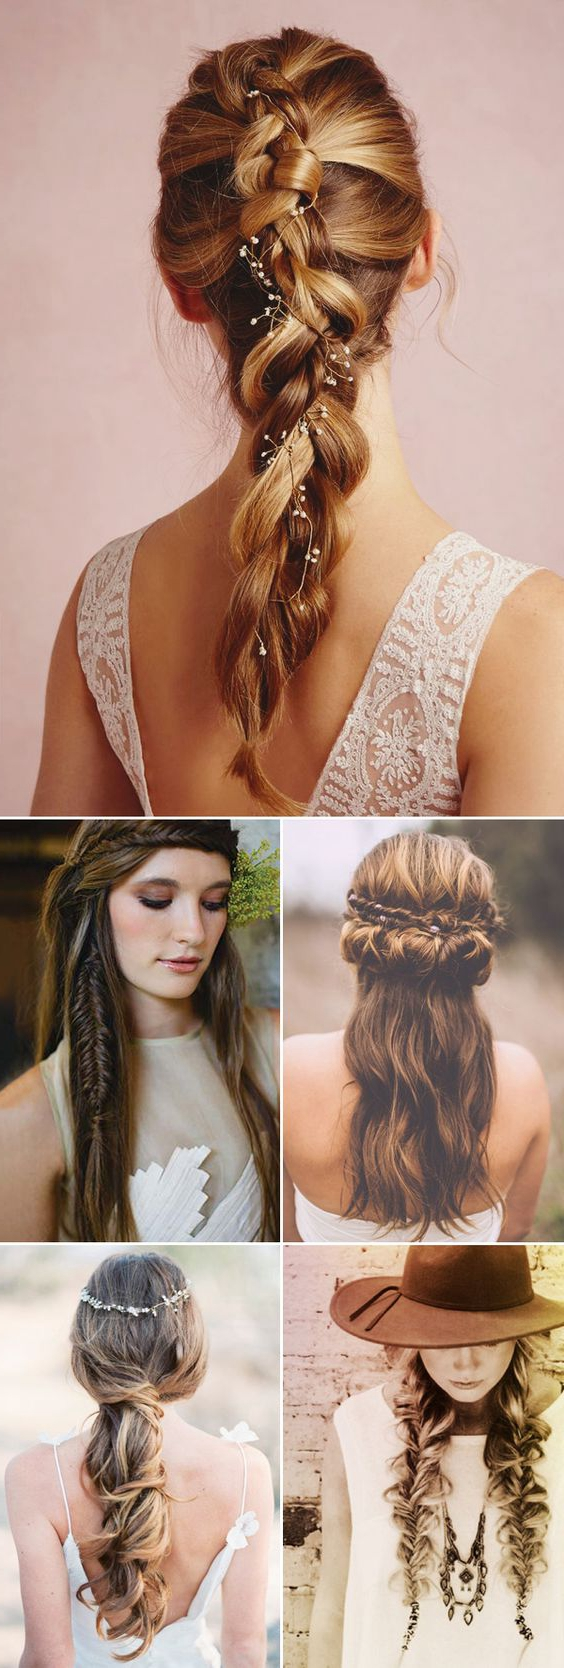 natural-bohemian-braided-hairstyles